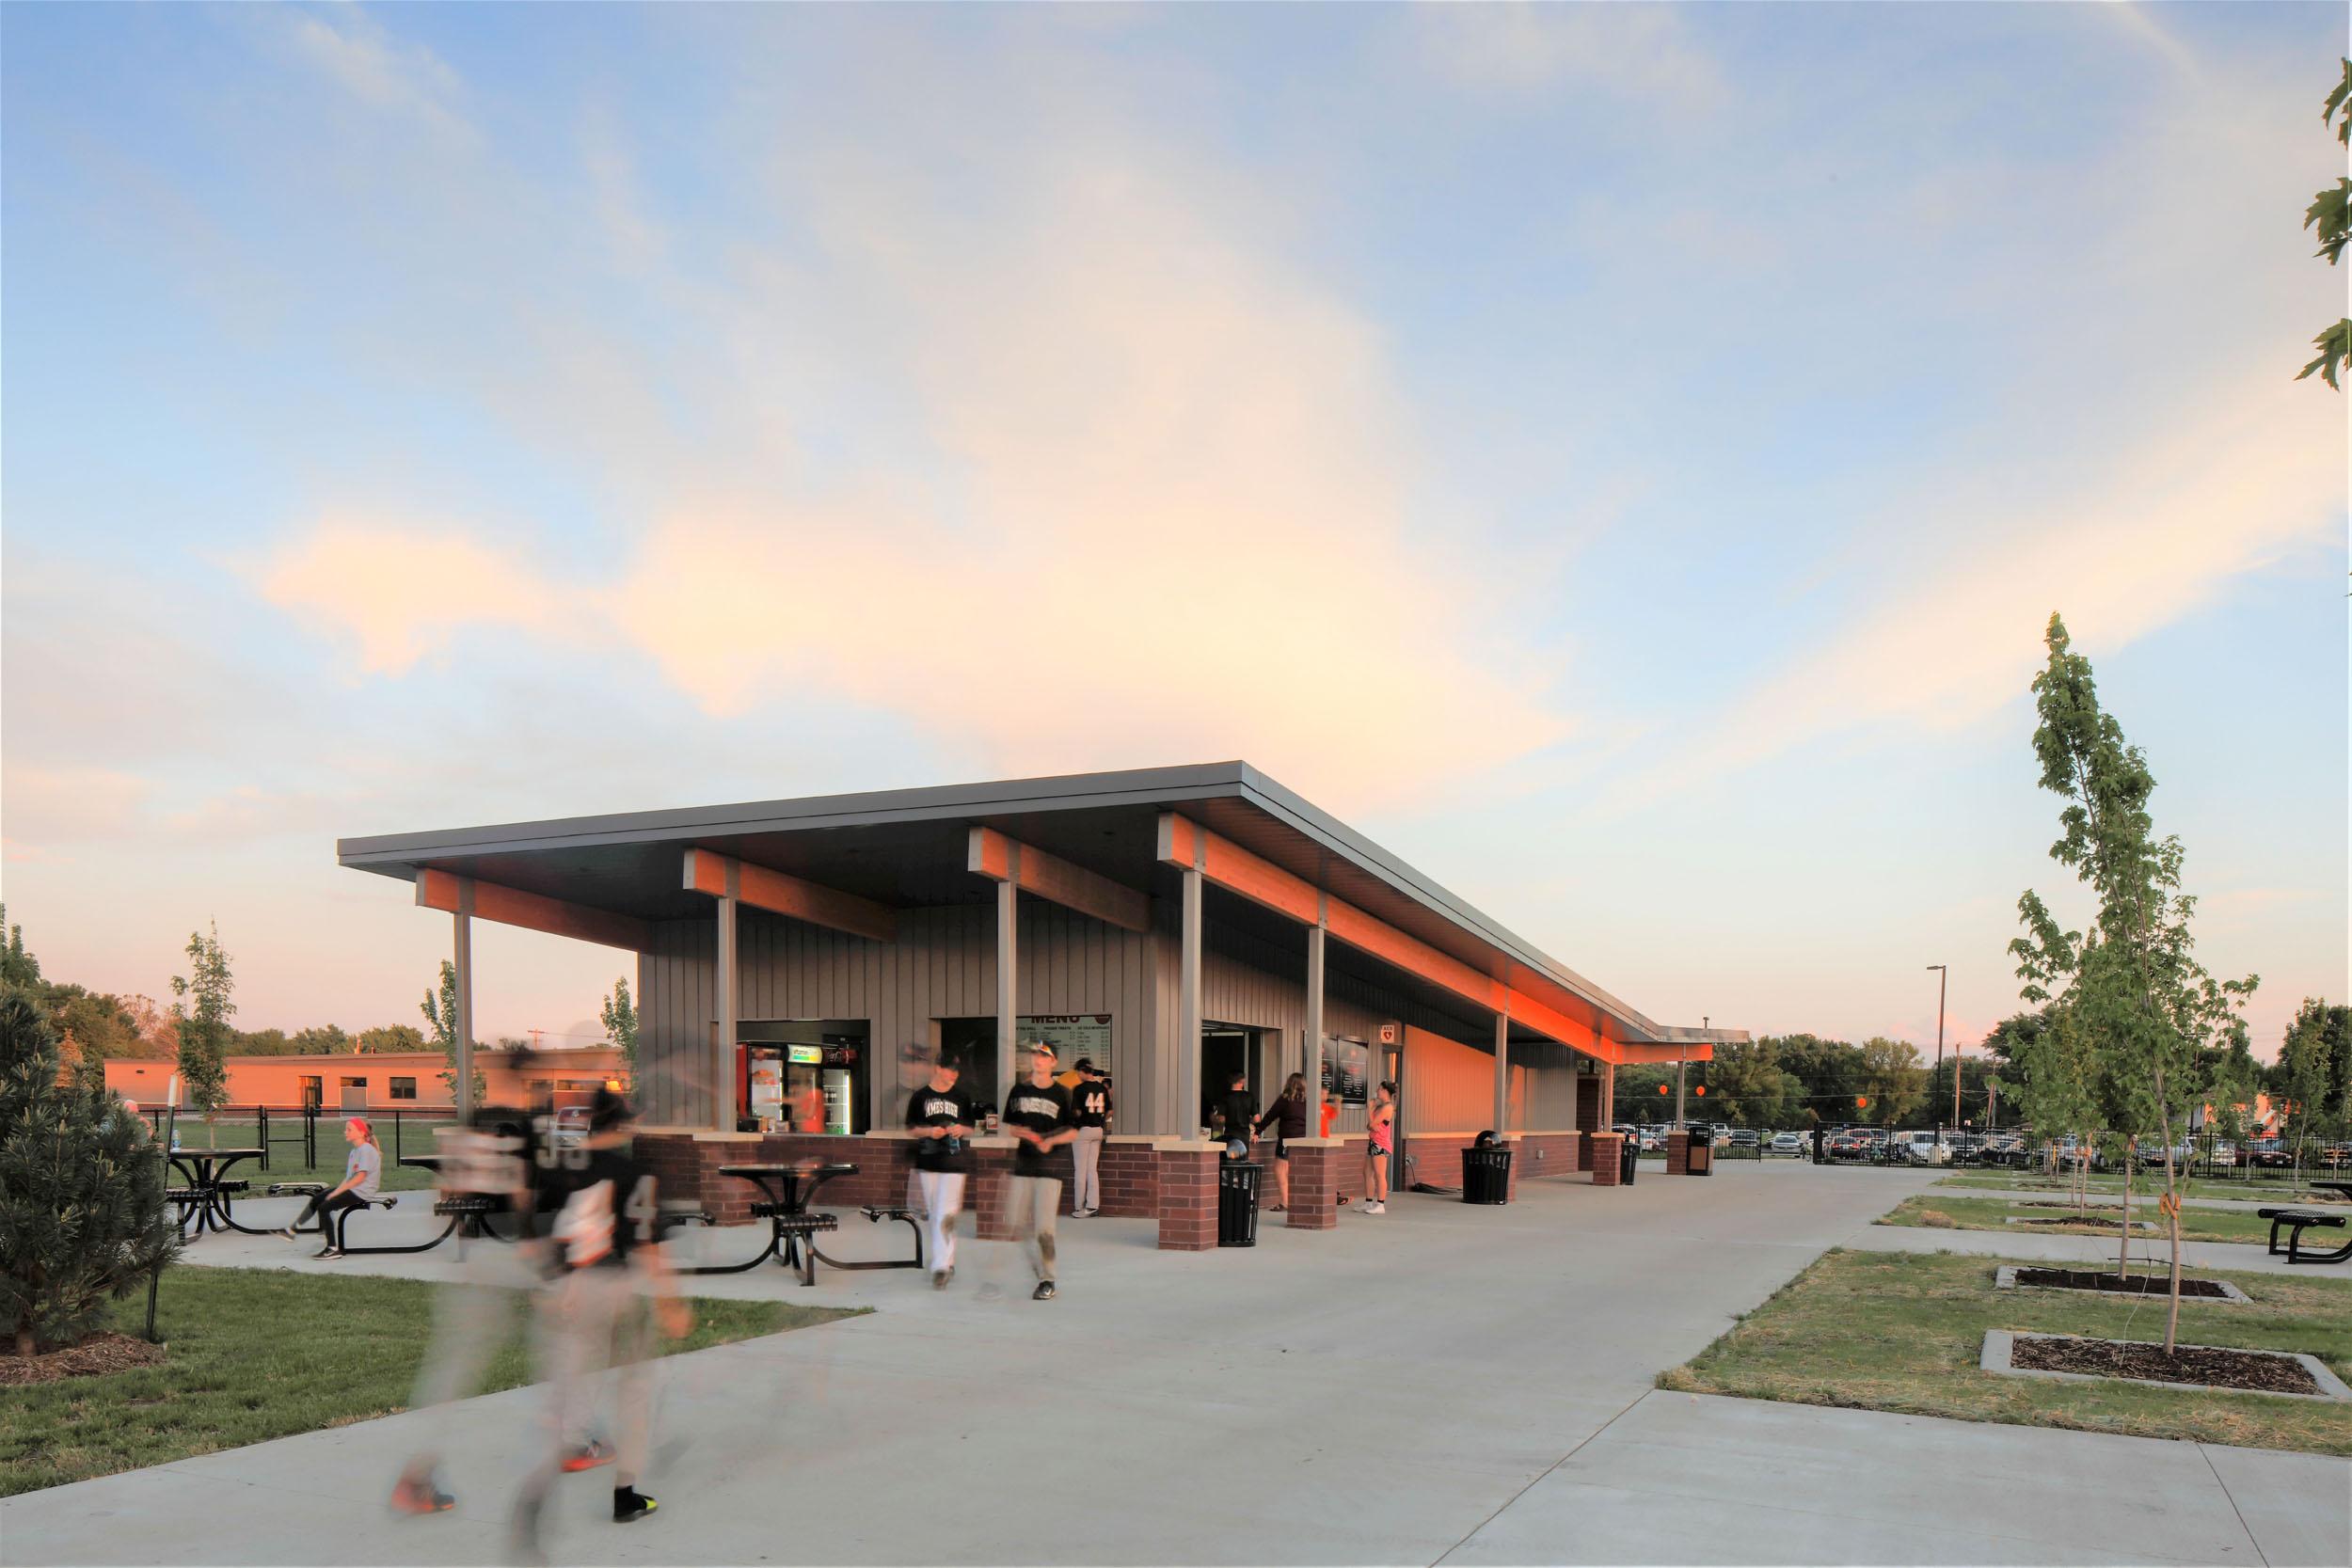 377-Ames-Baseball-Softball-Complex